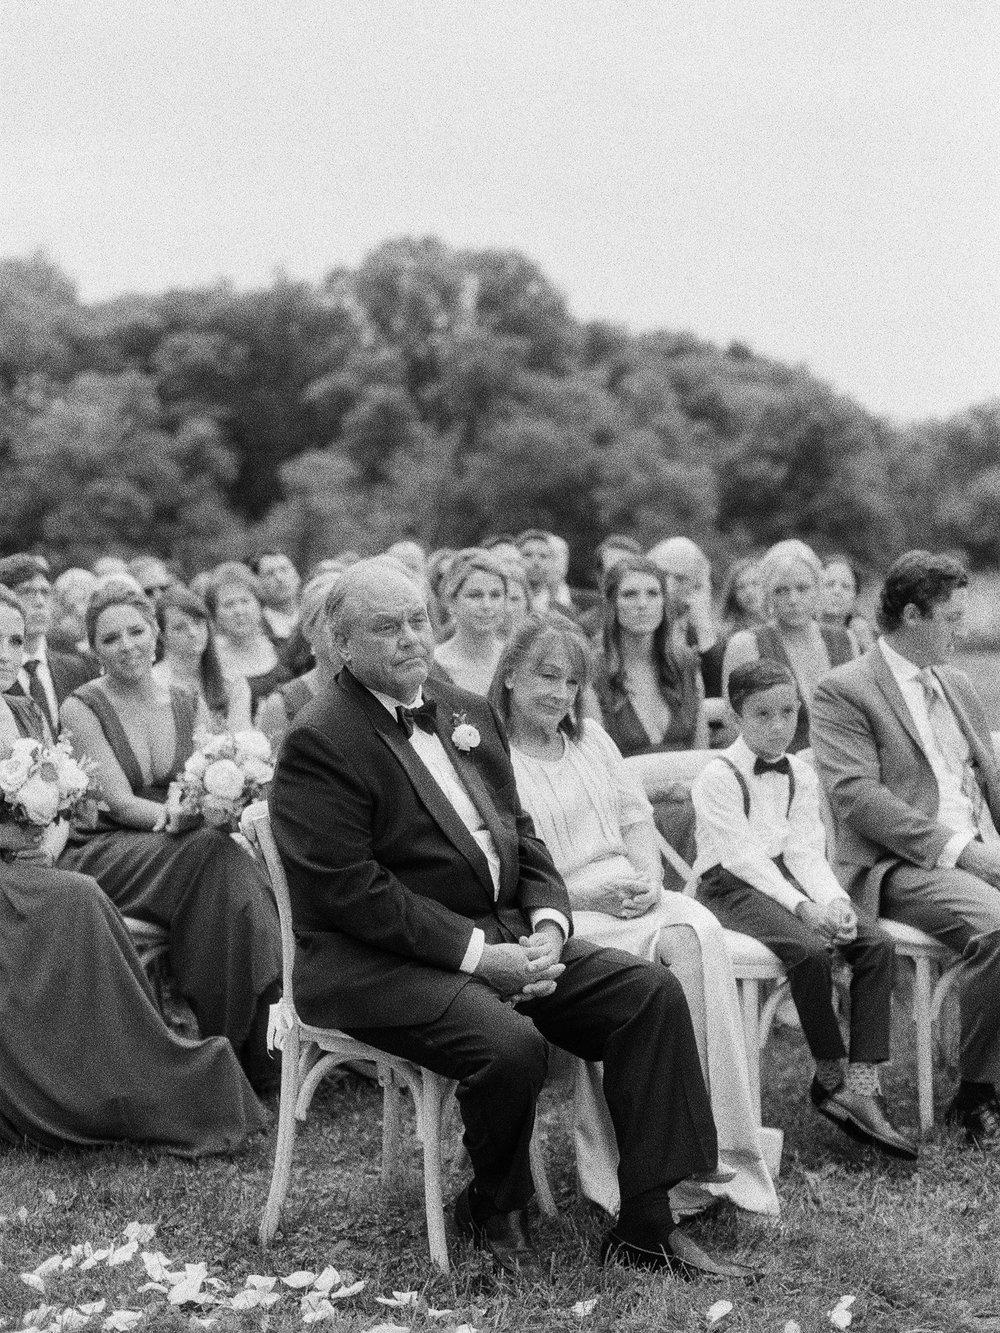 Ankony_Farm_Wedding-102-Jen-Huang-AS-608-Jen-Huang-000013180007.jpg